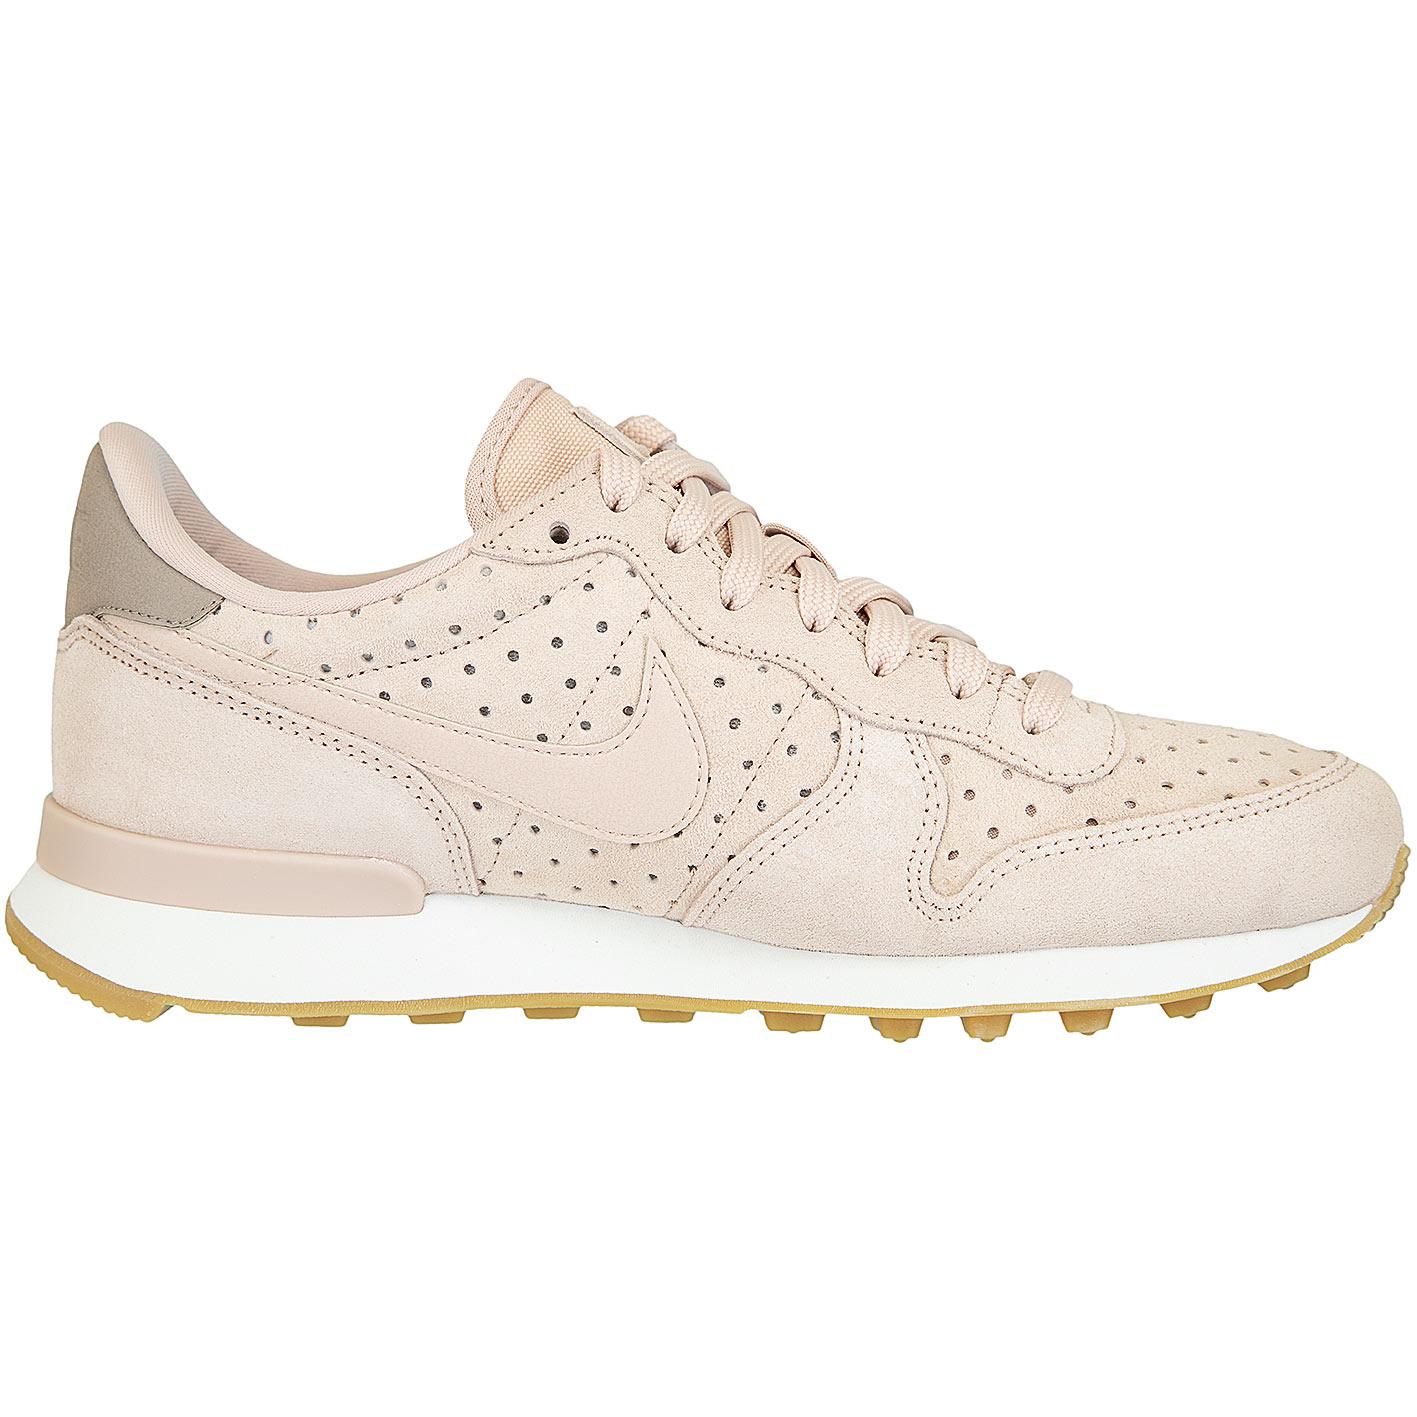 bc1675d2c711dc ☆ Nike Damen Sneaker Internationalist Premium rosa - hier bestellen!